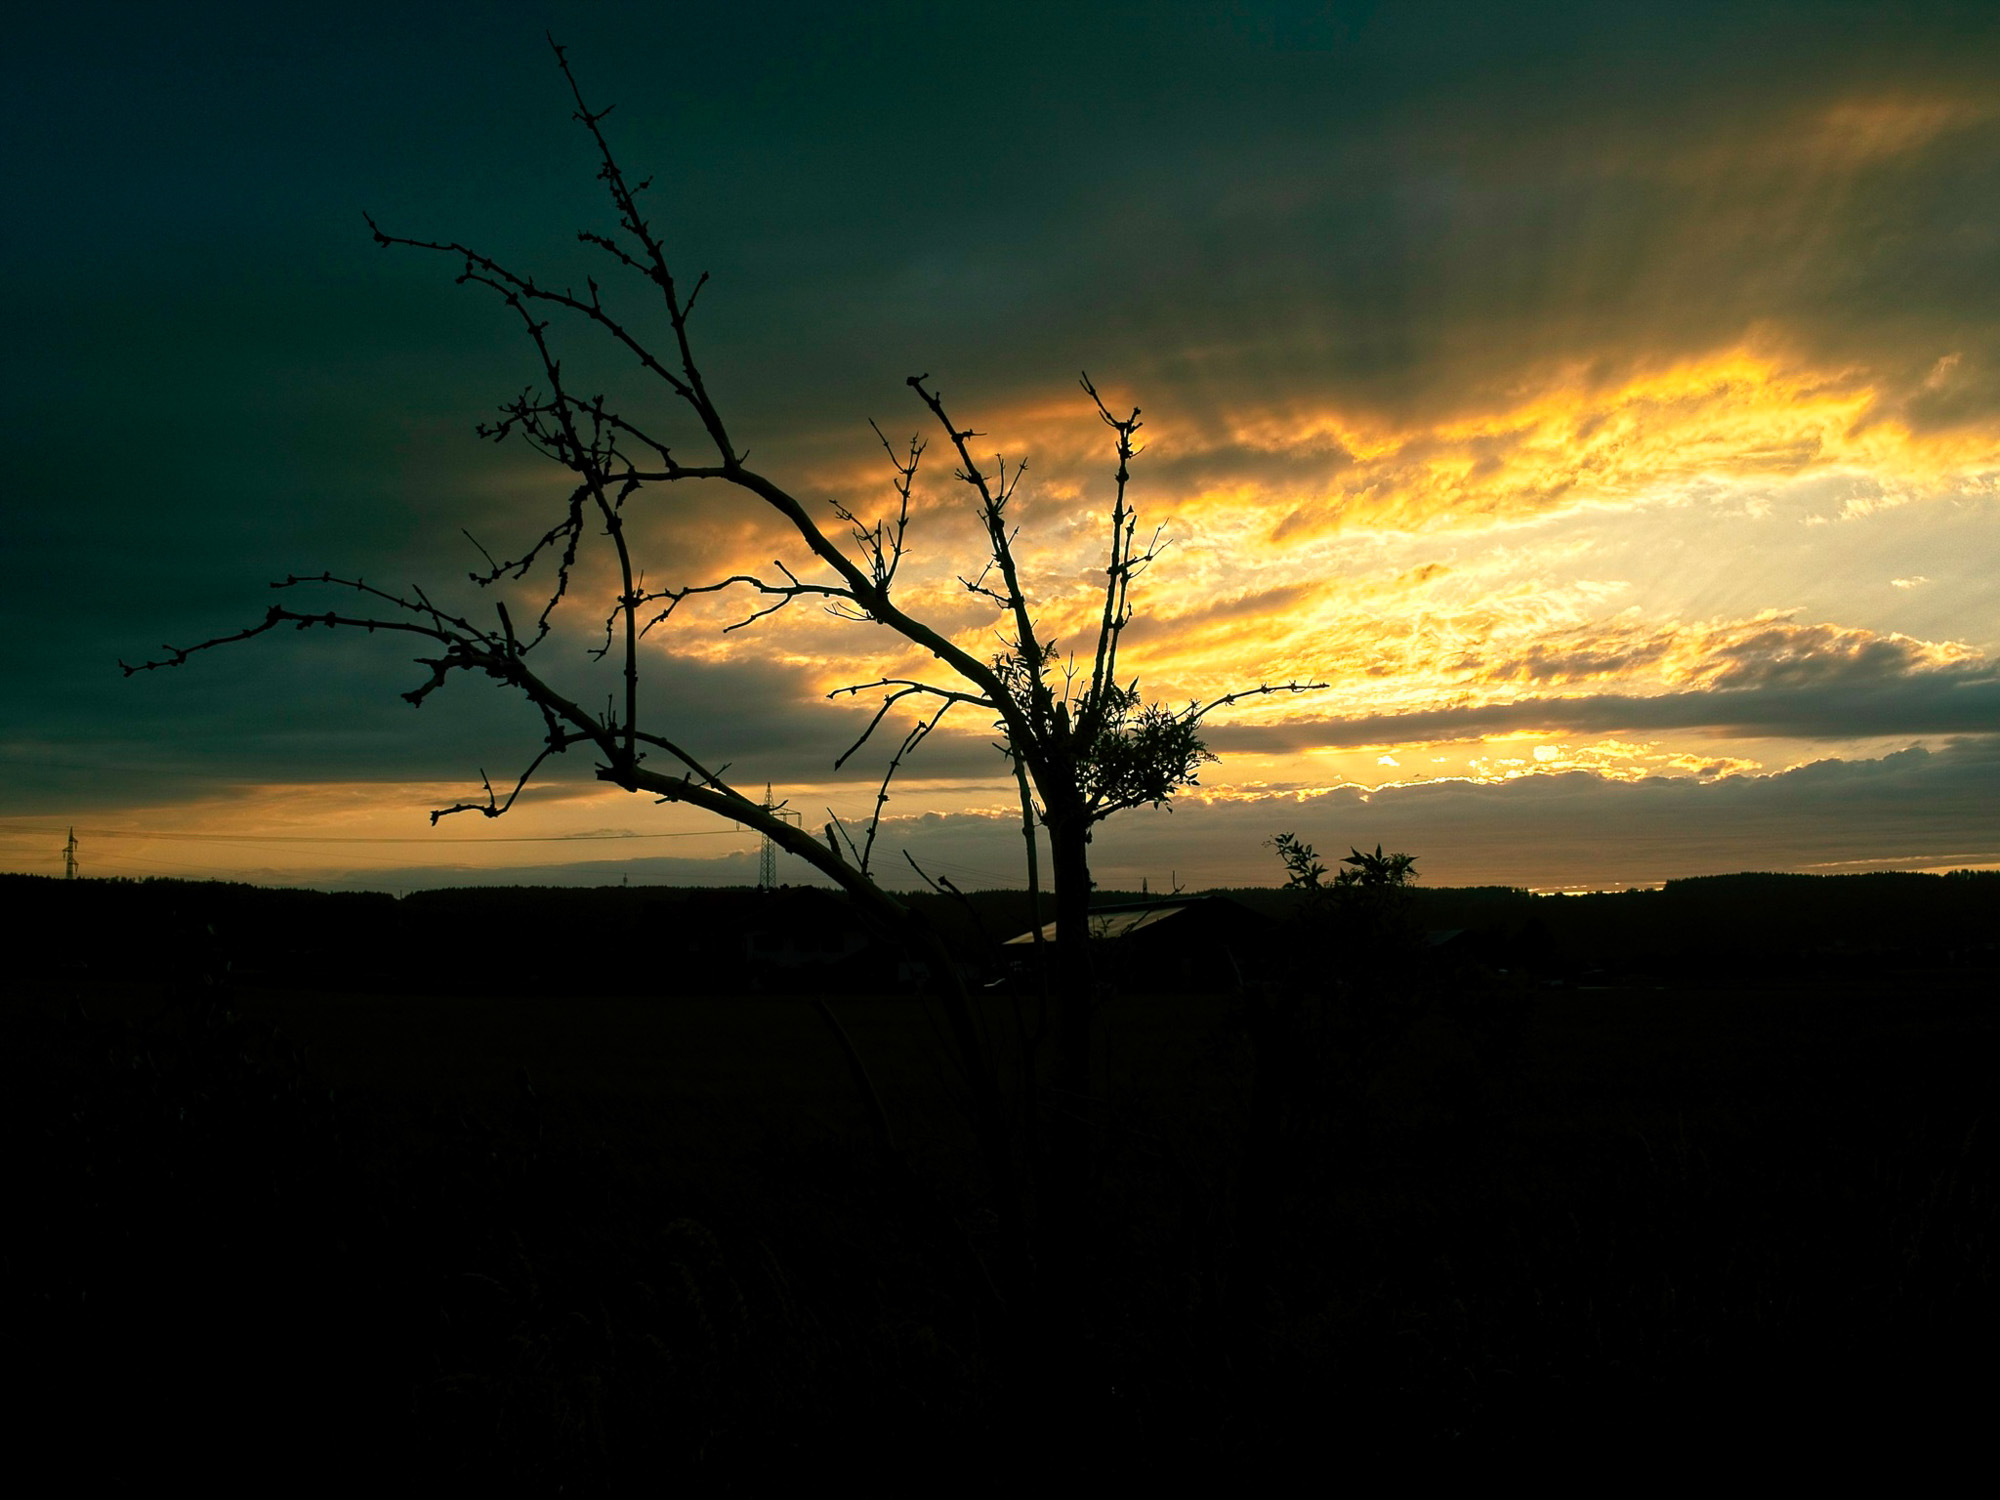 Sonnenuntergang nach dem Sturm